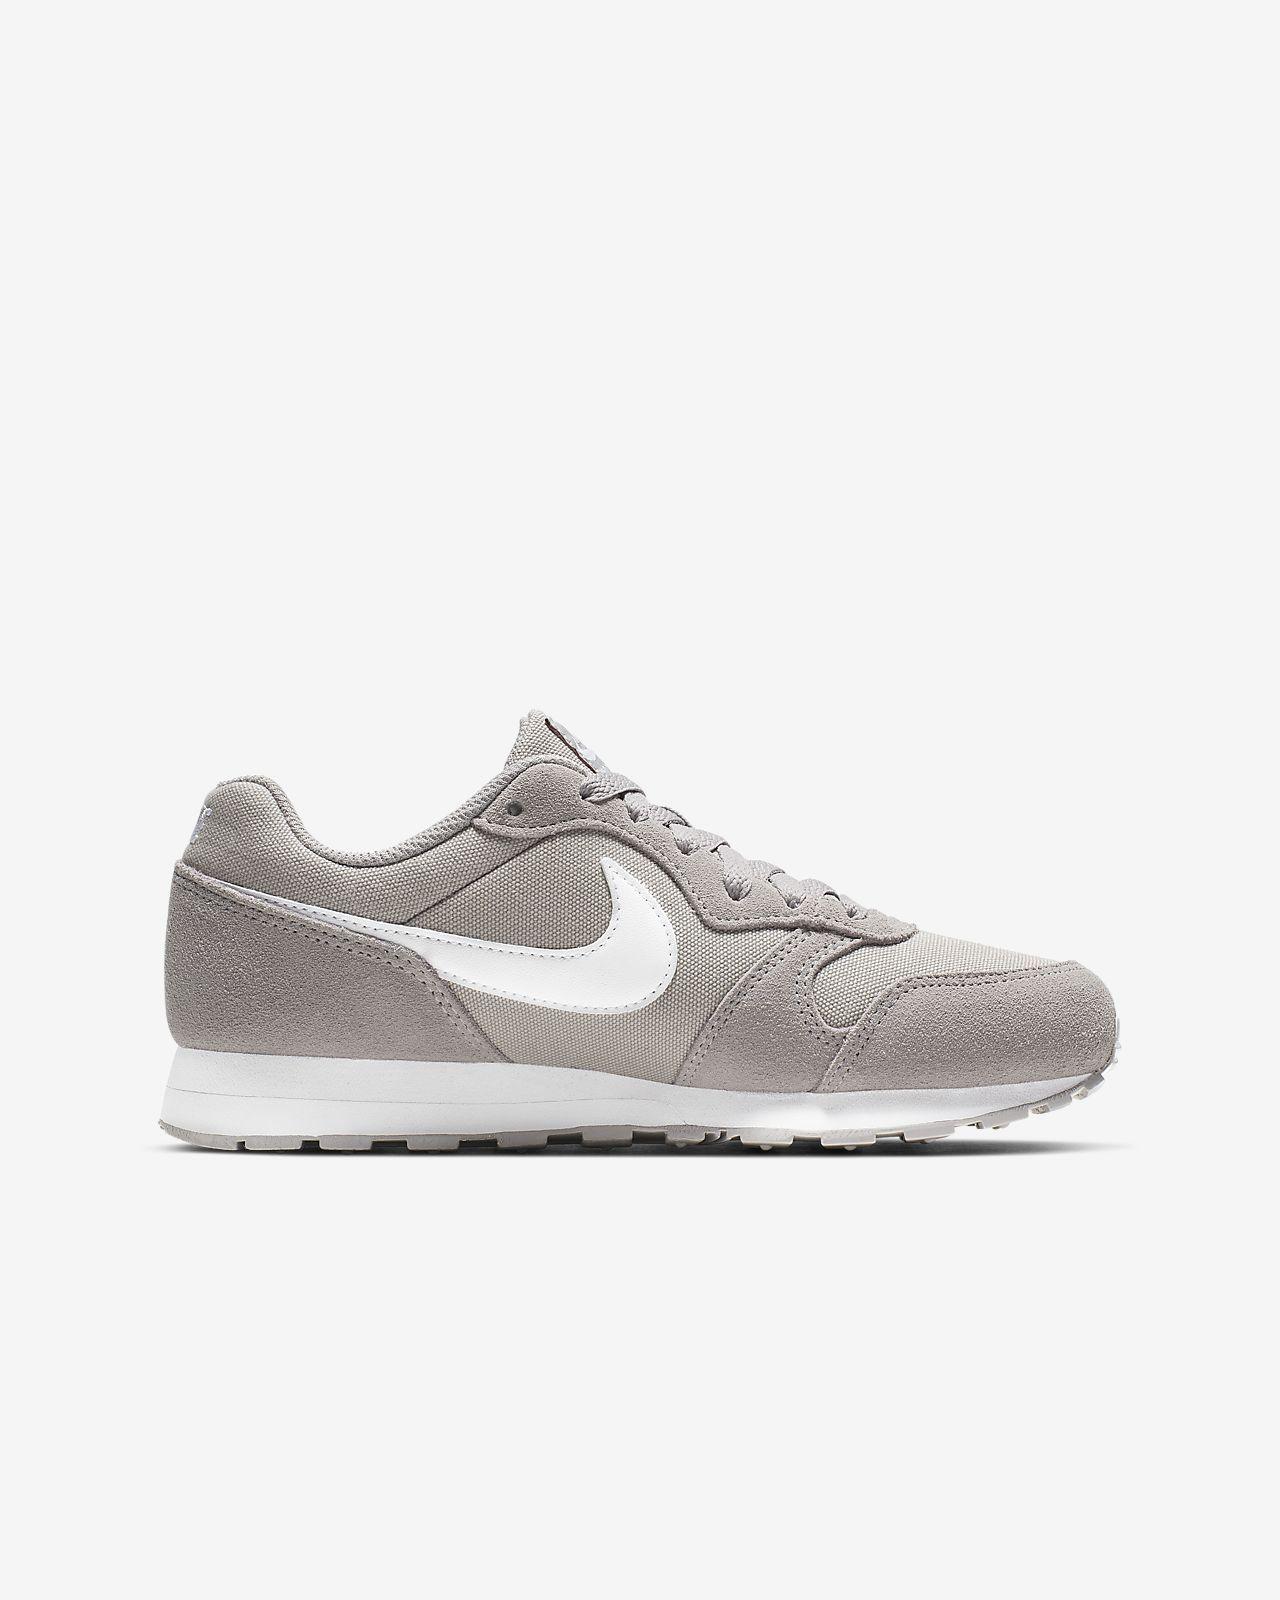 the latest 3488b 0c5d8 ... Nike MD Runner 2 PE Zapatillas de running - Niño a